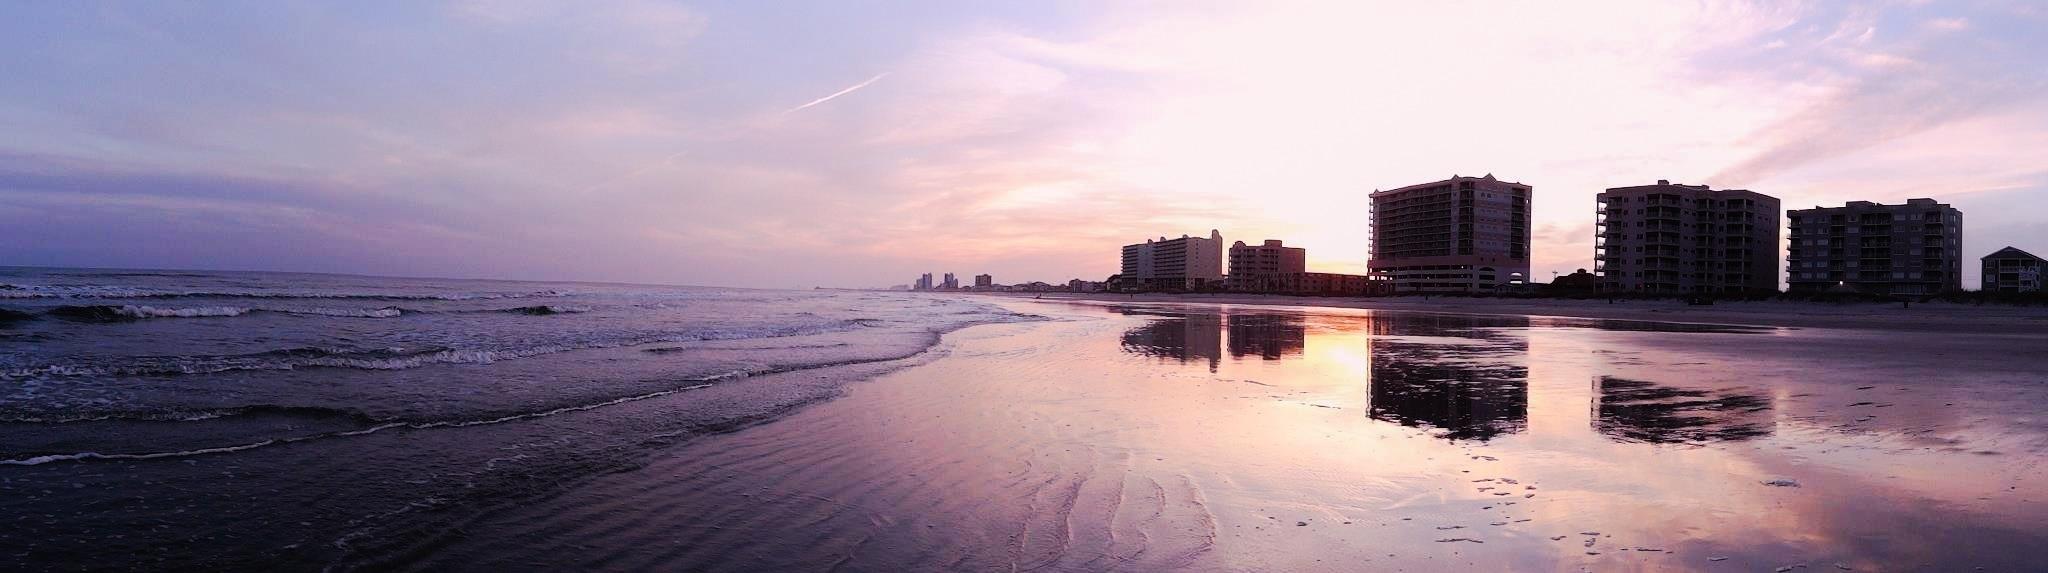 Prince Resort, North Myrtle Beach, South Carolina, United States of America